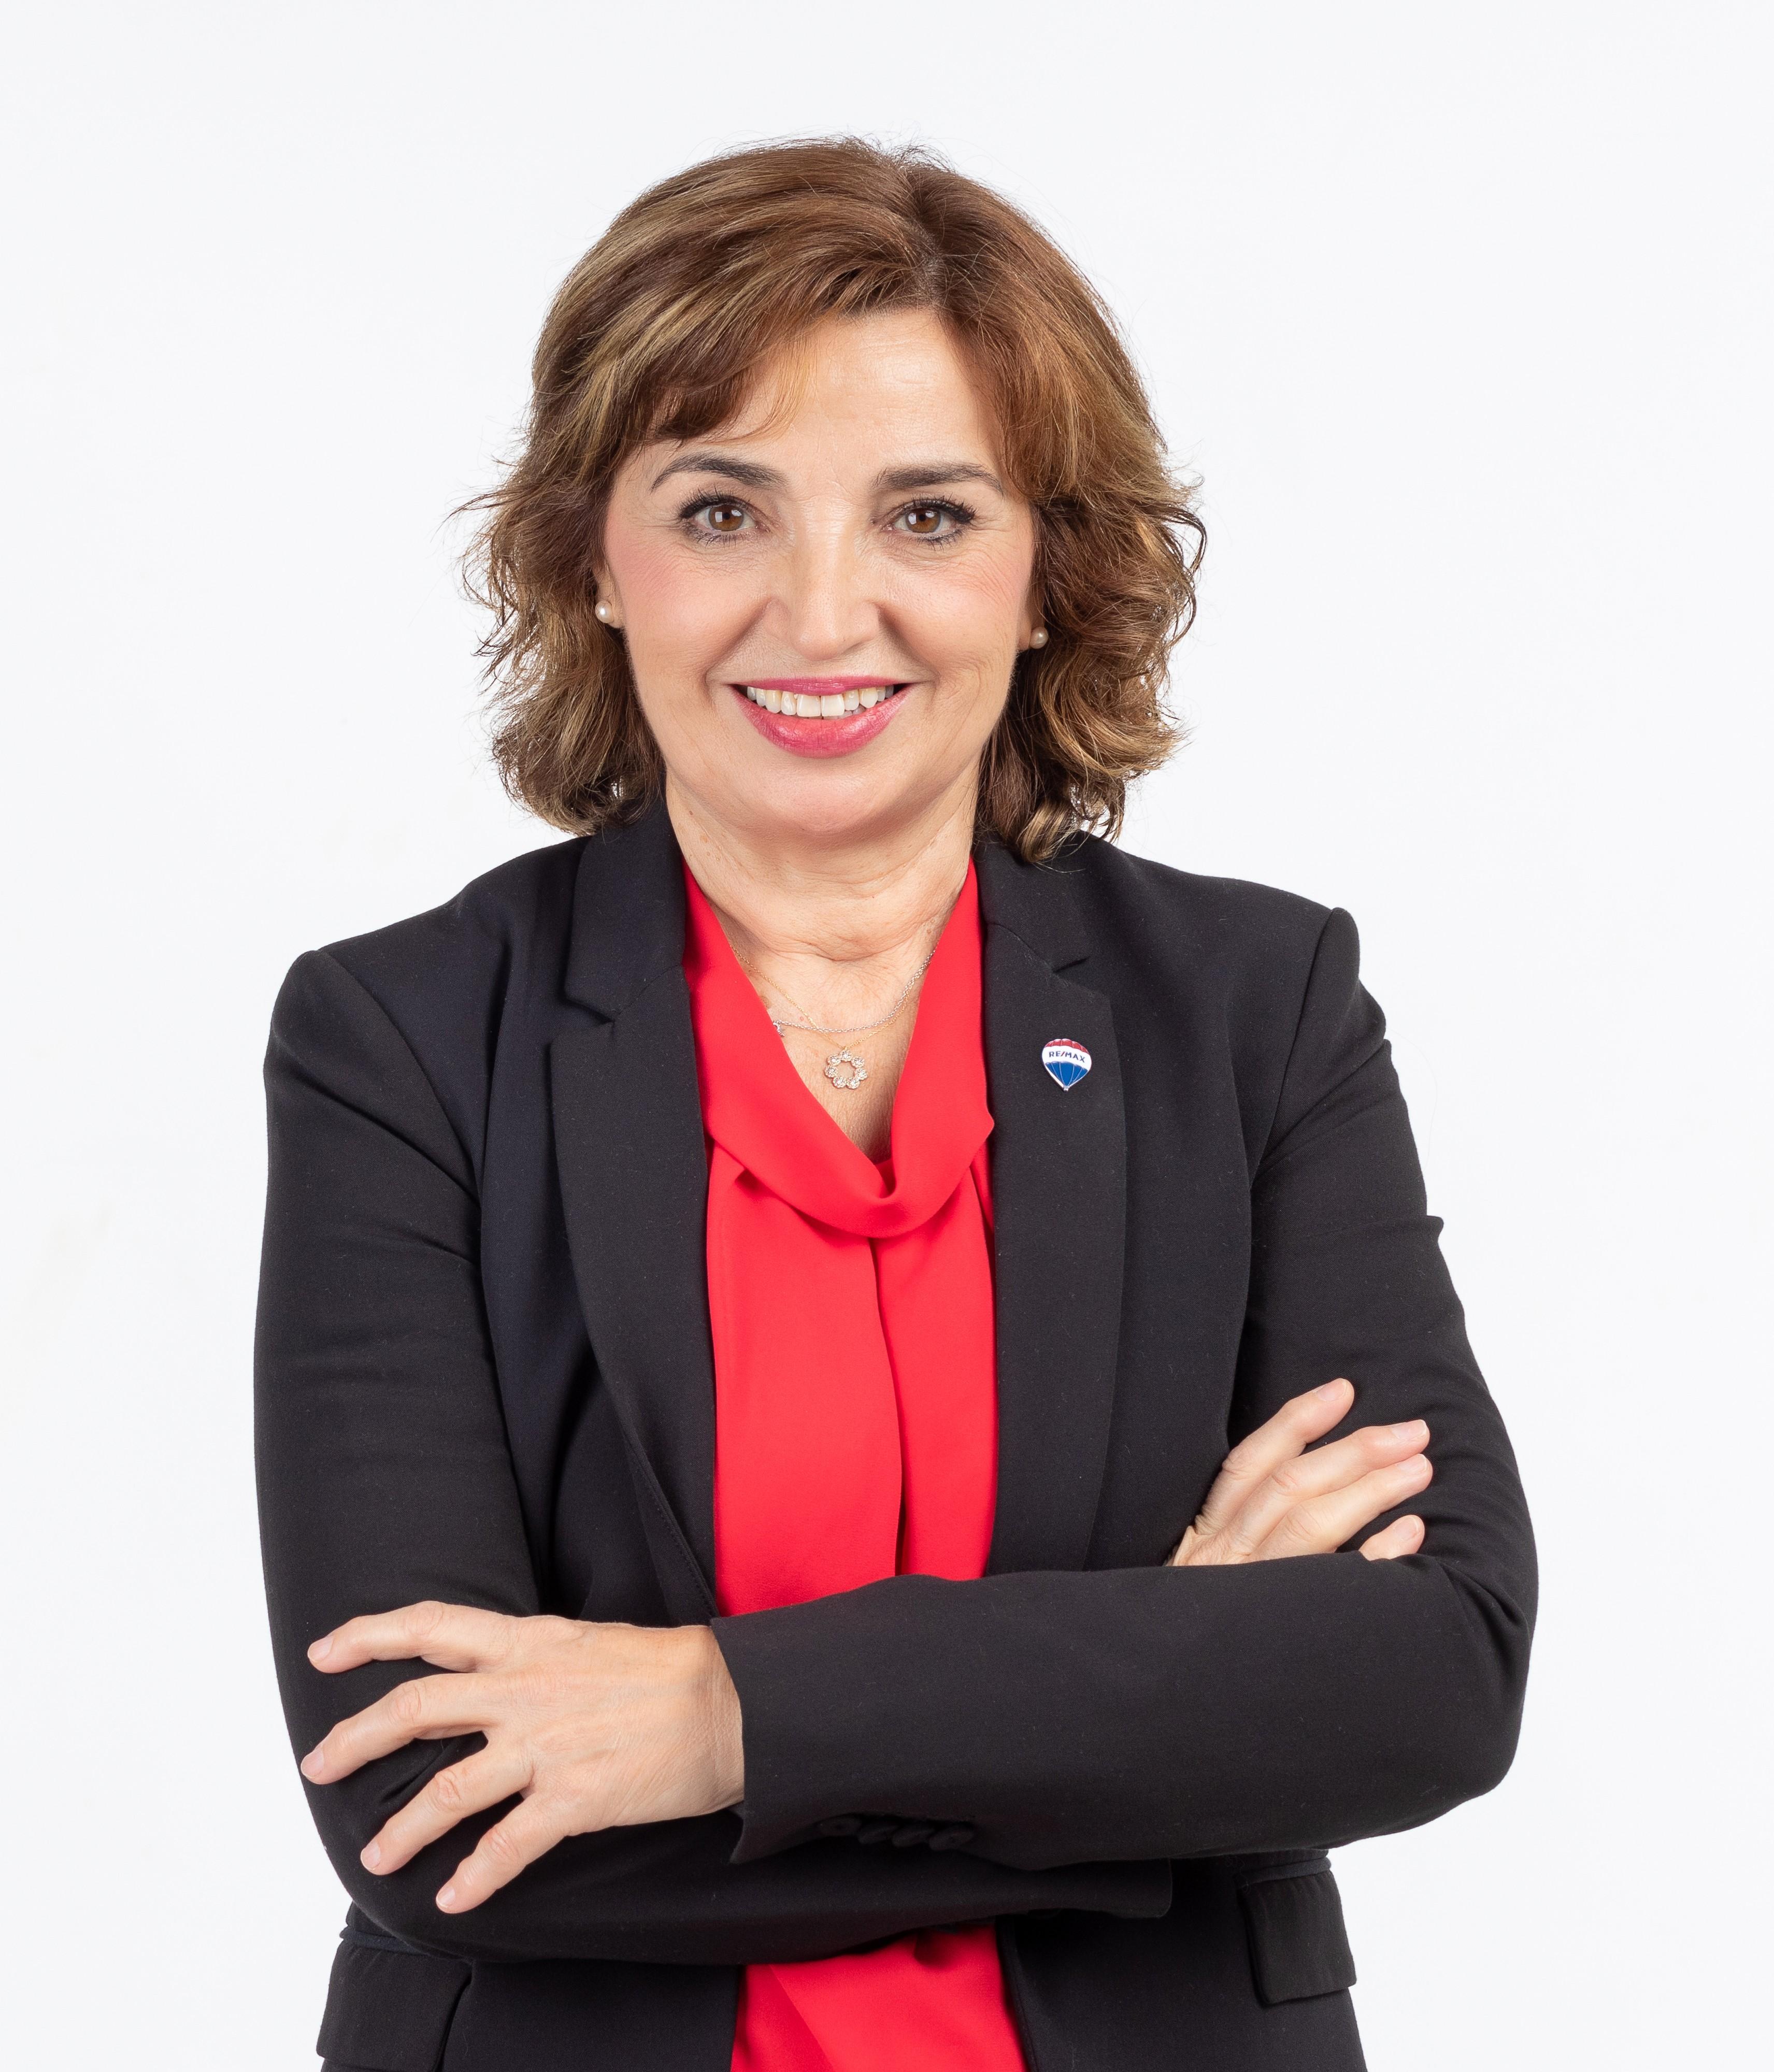 Mercedes Duque Pico